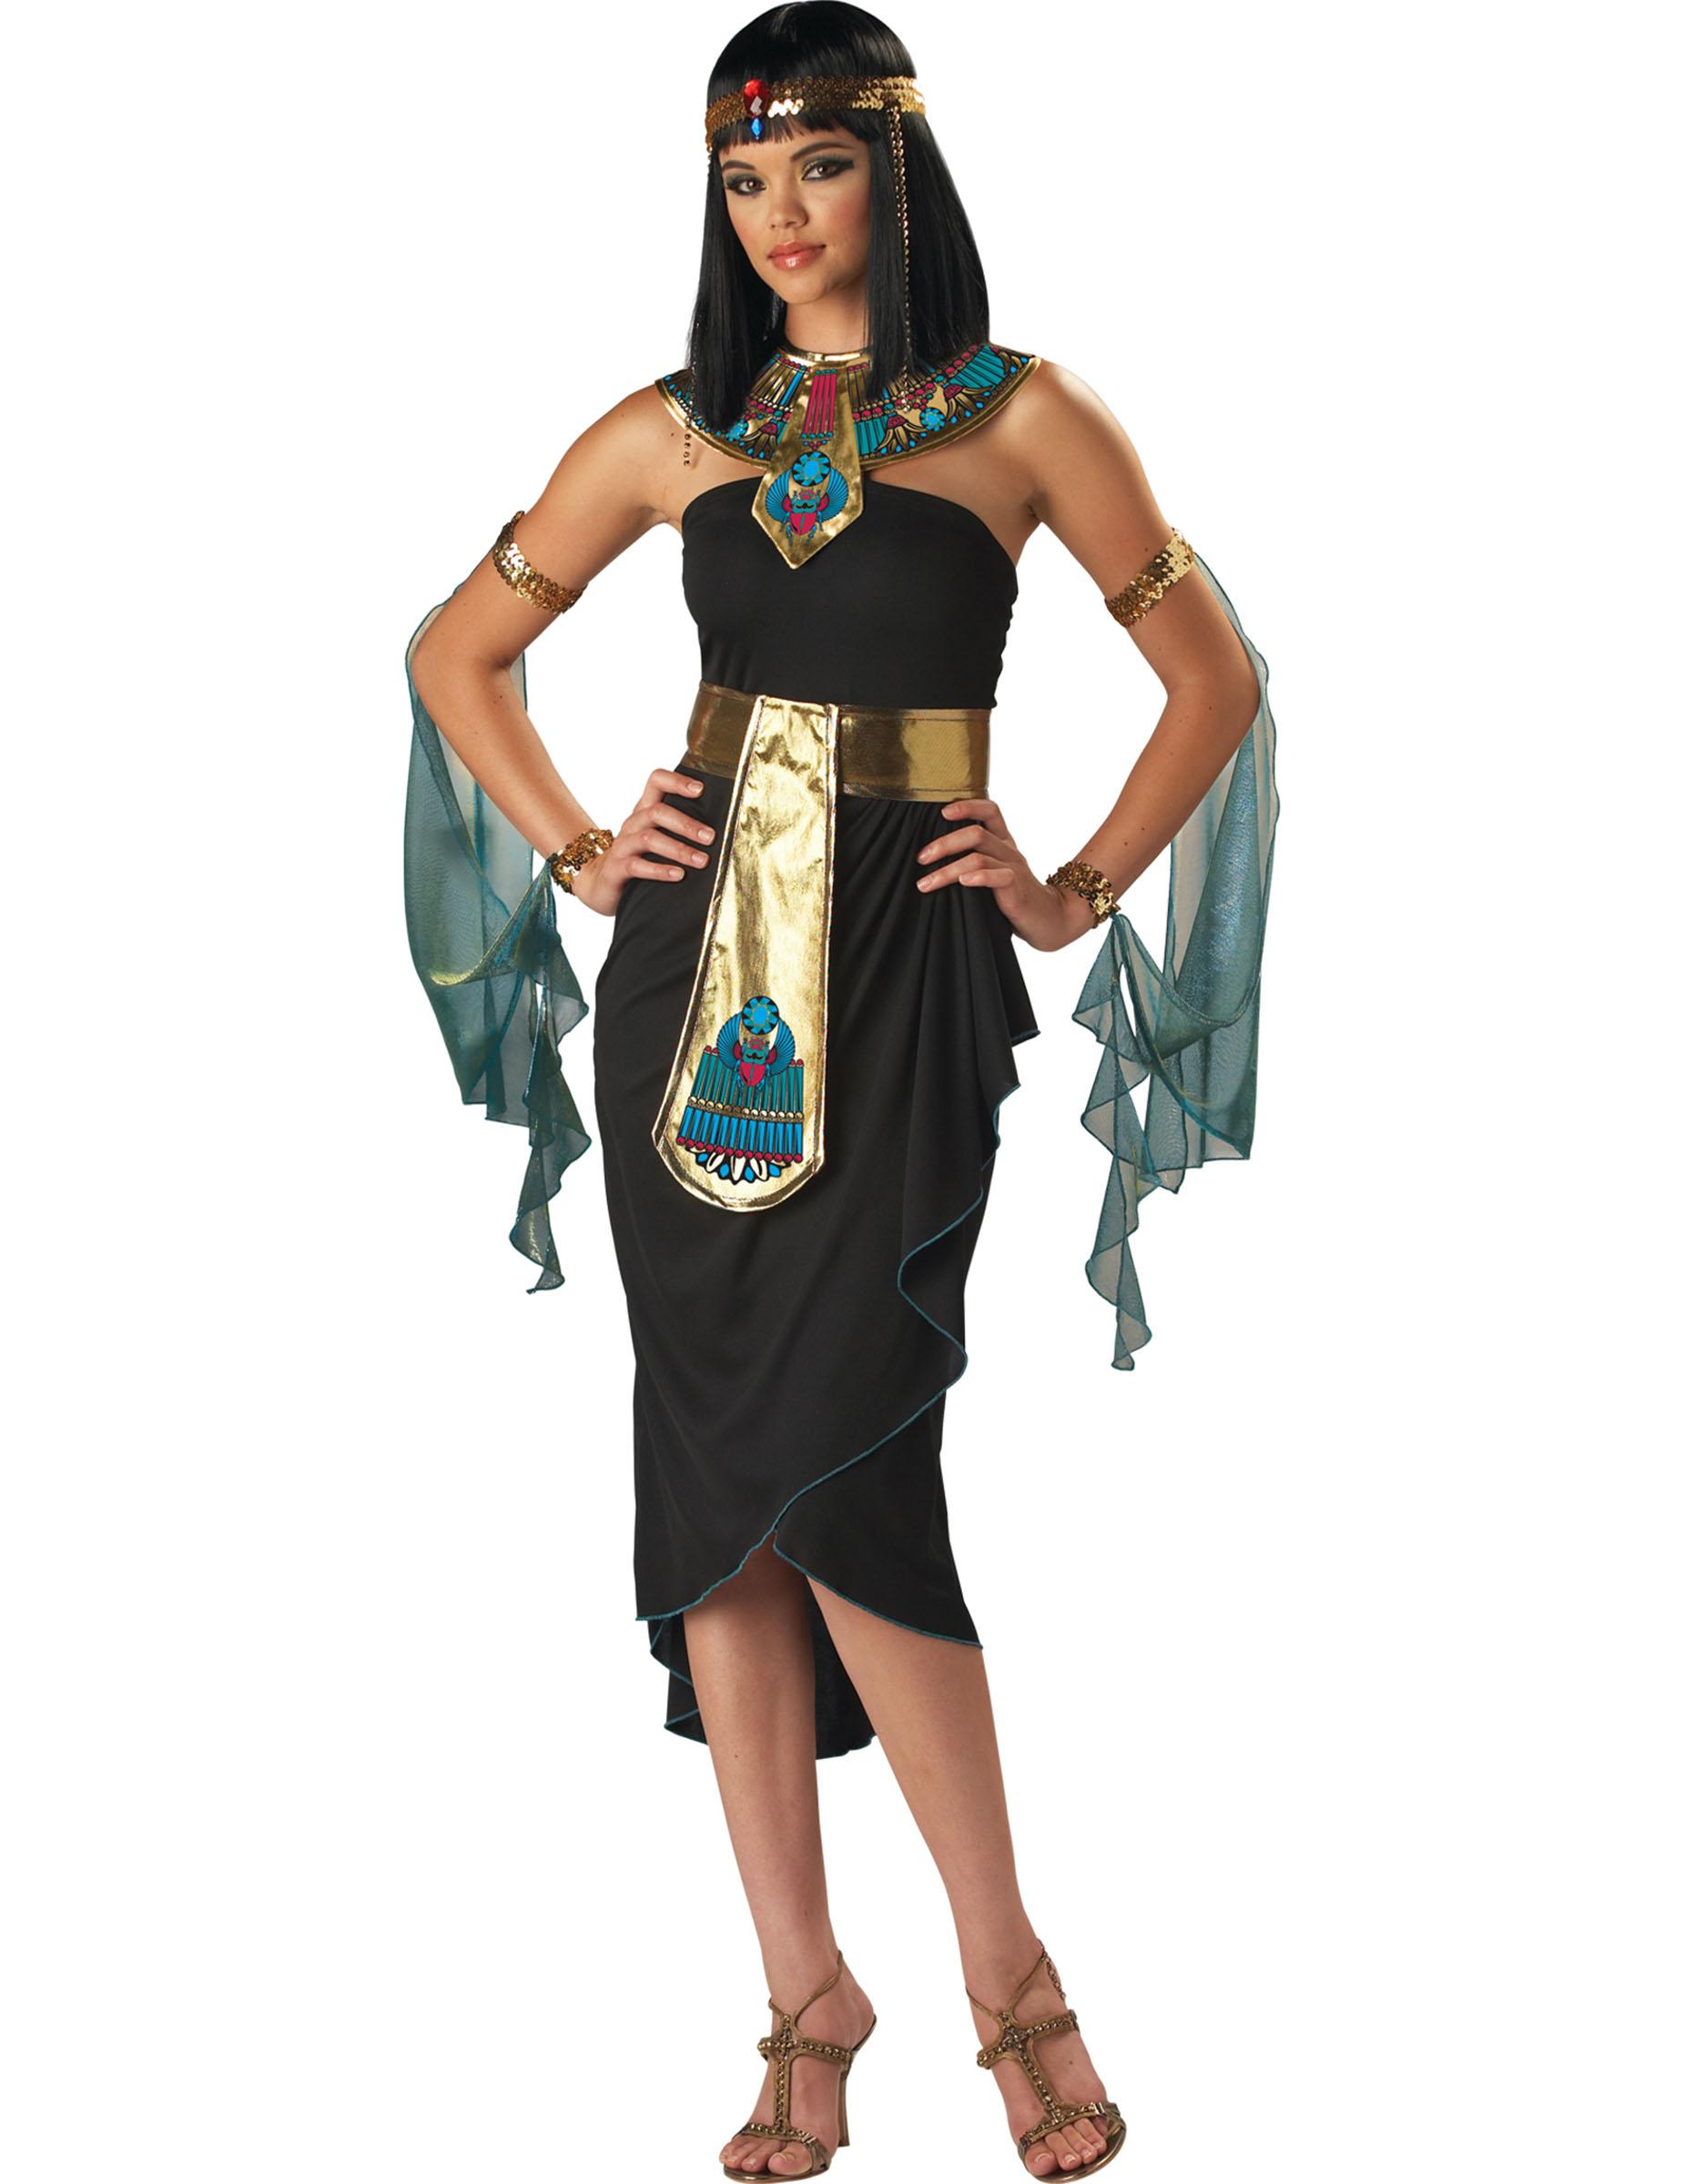 a996a08bf8c0 Costume Cleopatra per donna - Premium: Costumi adulti,e vestiti di ...